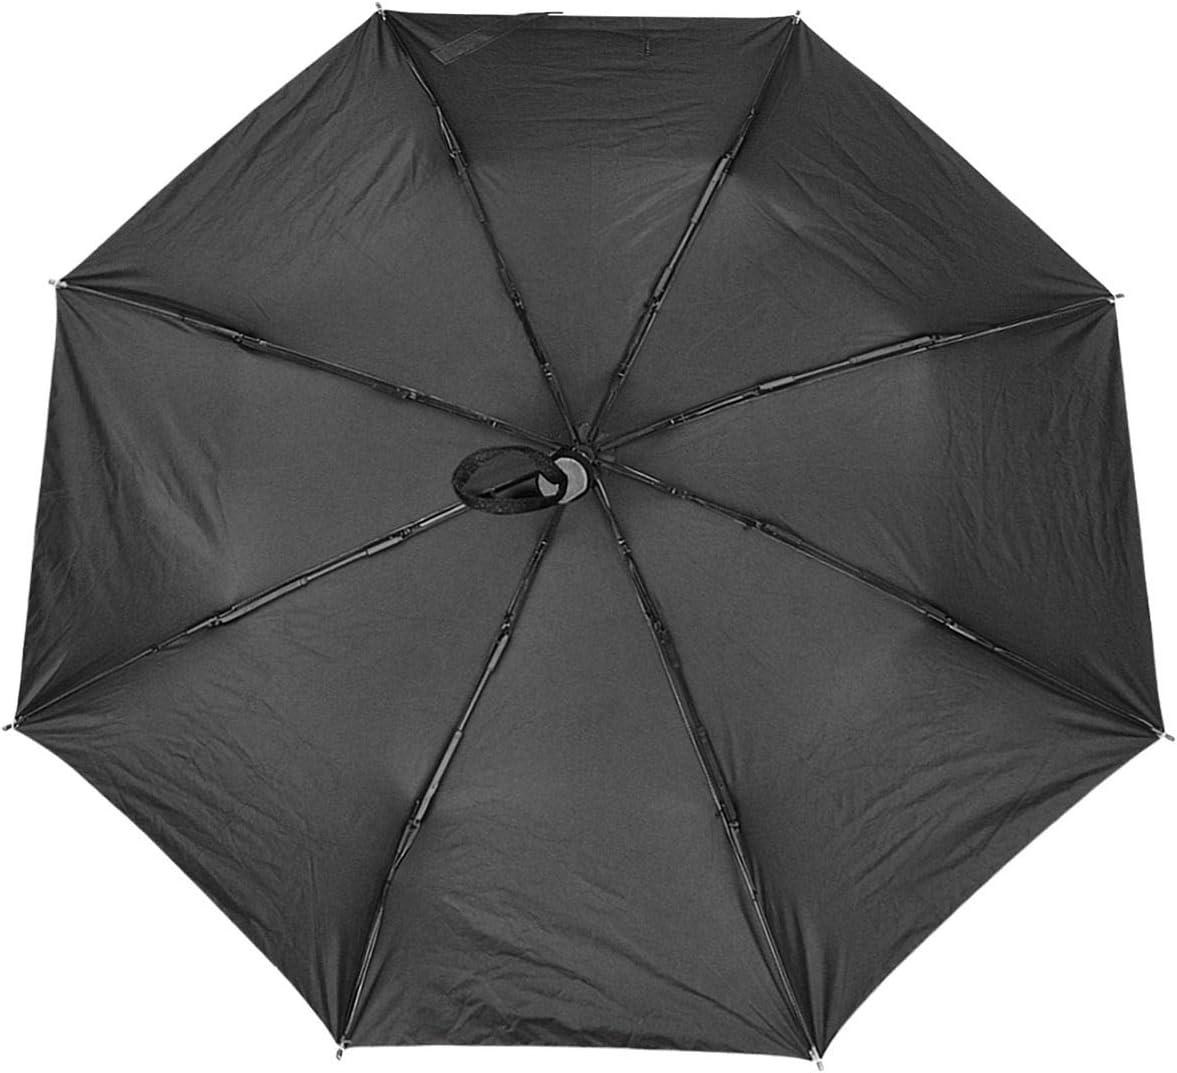 Toron-to Blue Jay-s Compact Folding Business Umbrellas UV Protection Manual Tri-fold Umbrella for Men and Women Lovesofun Portable Manual Umbrella